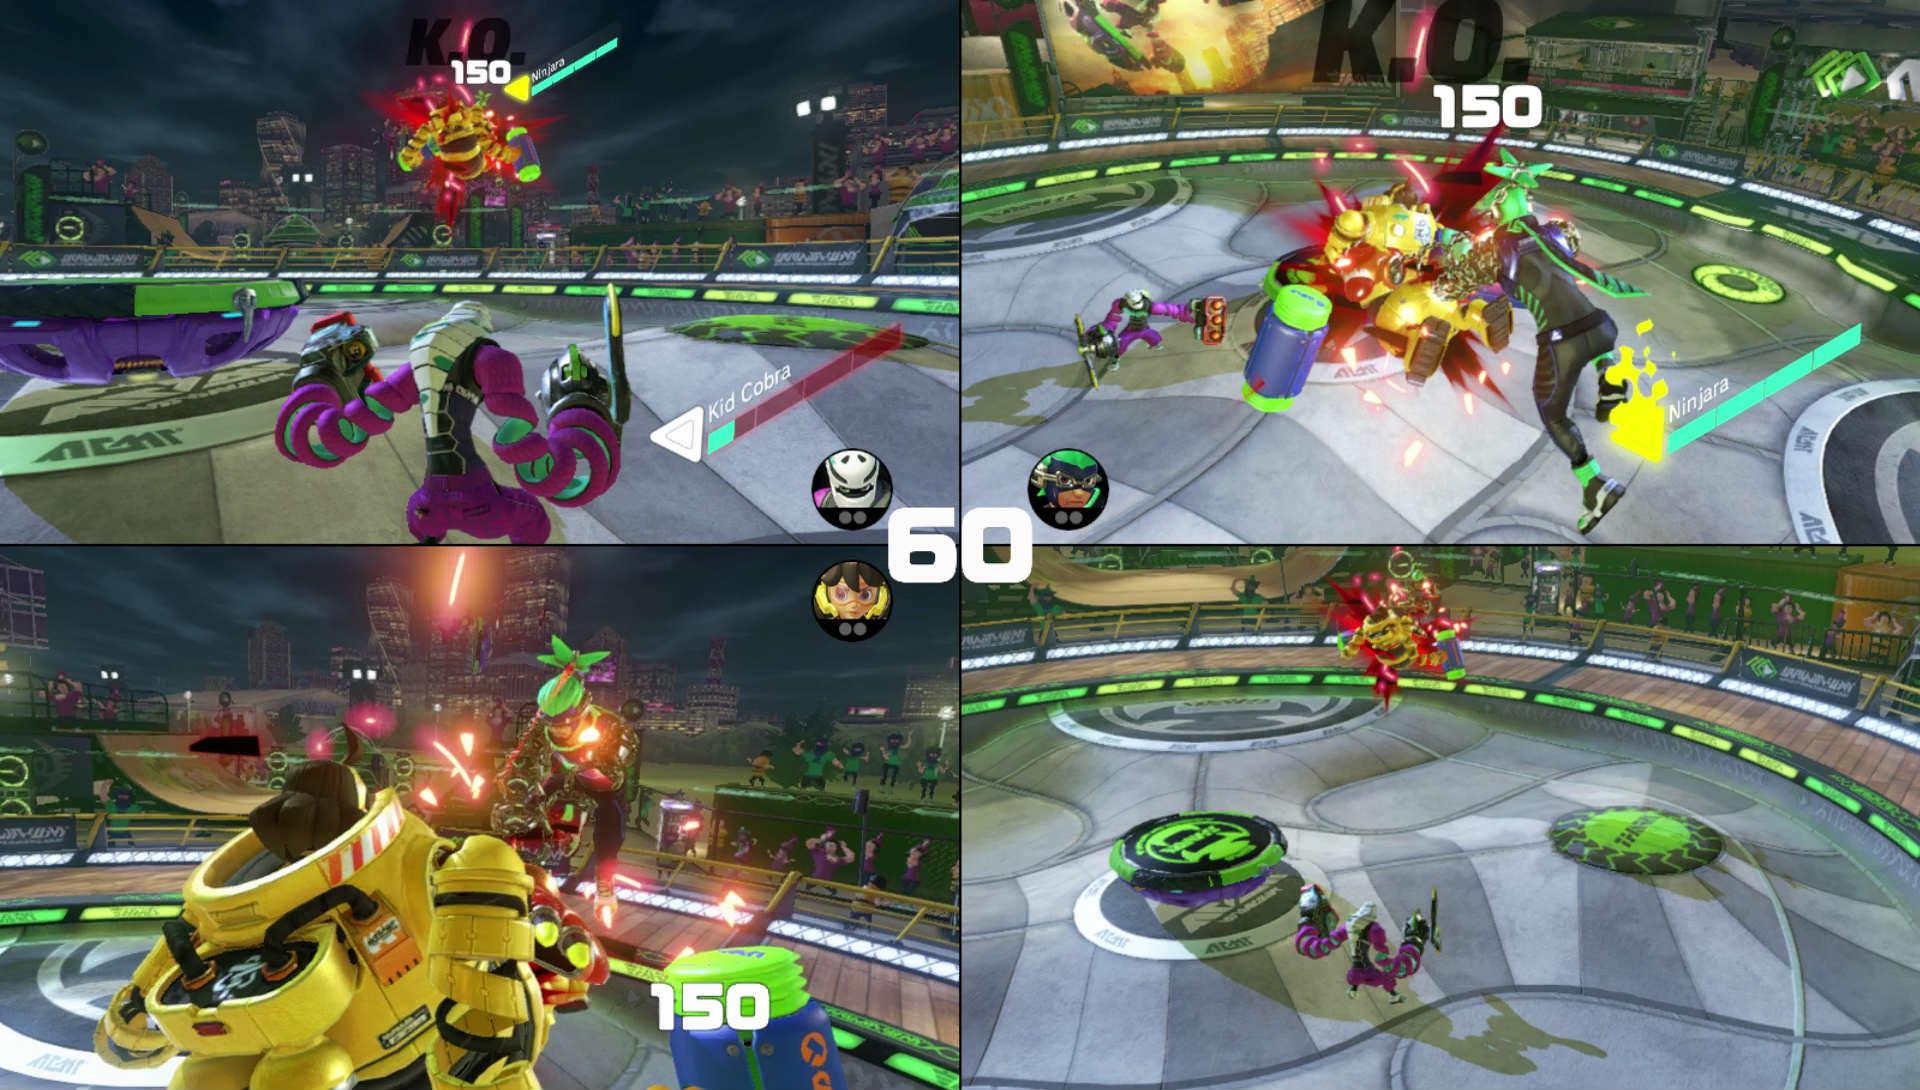 Resultado de imagen para arms nintendo switch multiplayer